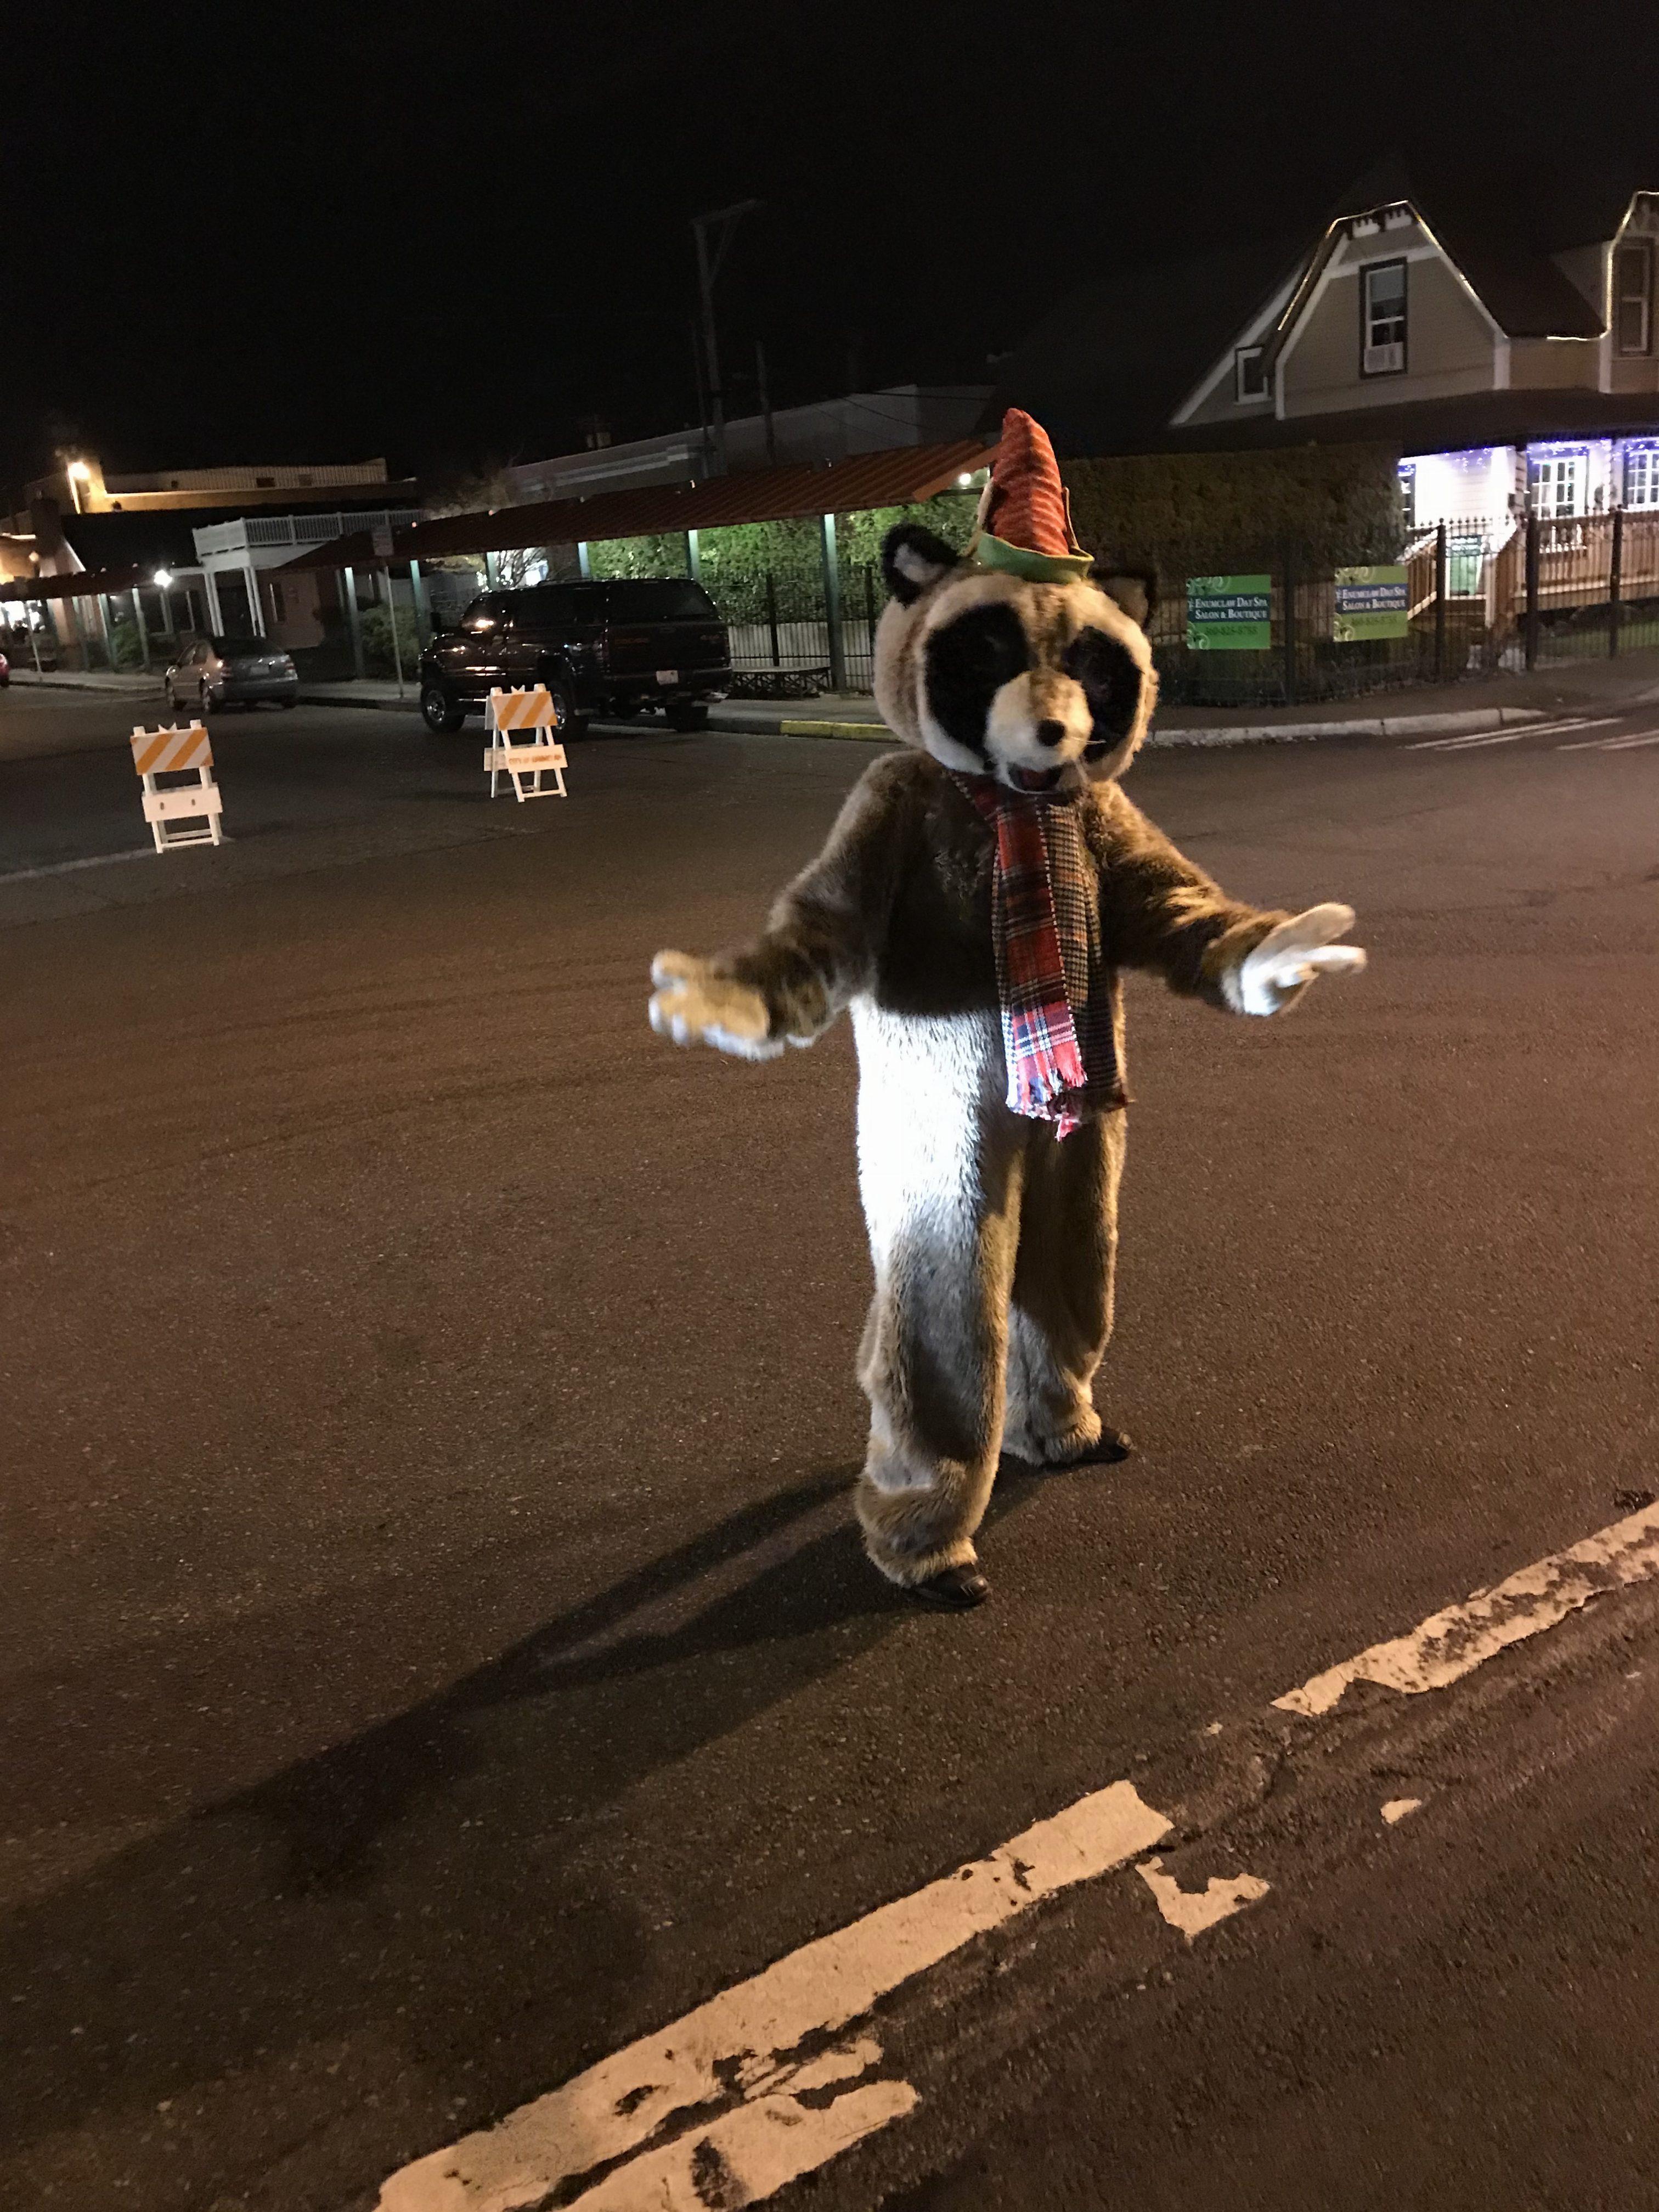 Rocky Raccoon standing in street